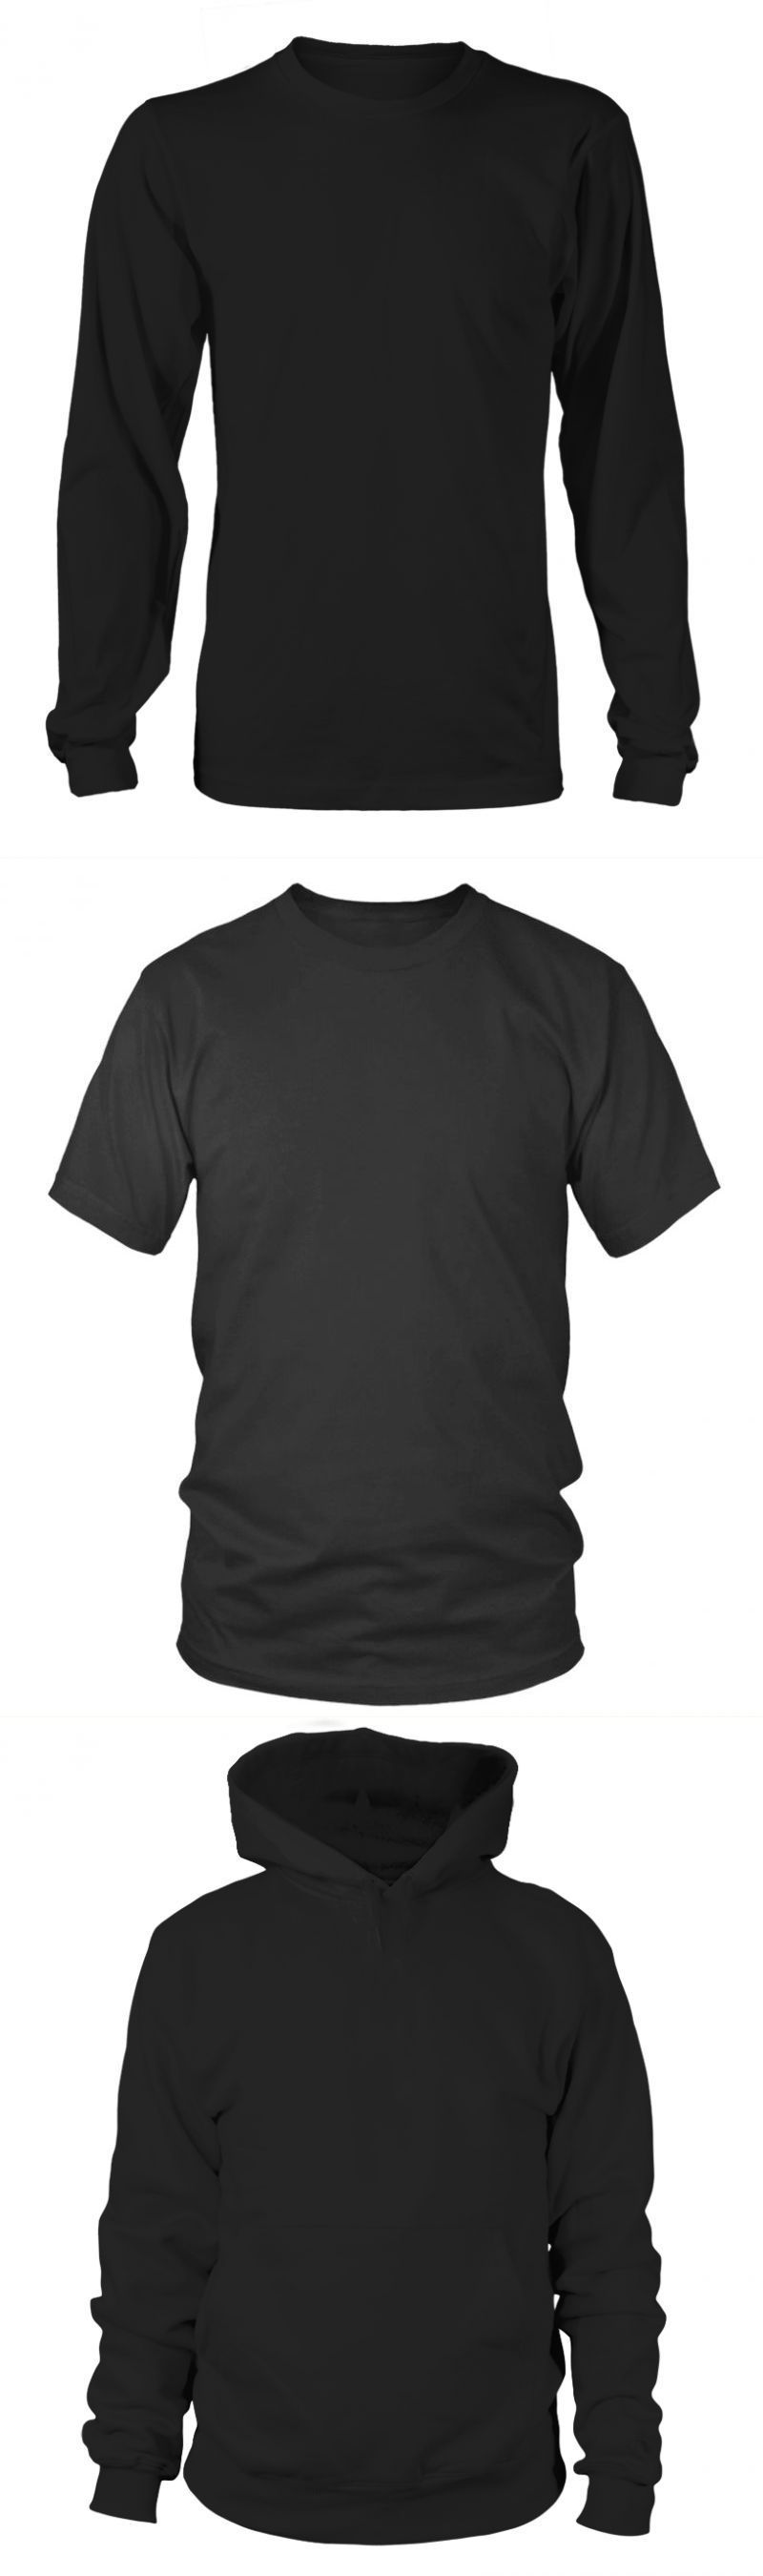 Vermont hockey t shirt limited edition - hockey i love hockey moms t shirt #vermont #hockey #shirt #limited #edition #love #moms #oilers #long #sleeved #t-shirt #unisex #round #neck #hoodie